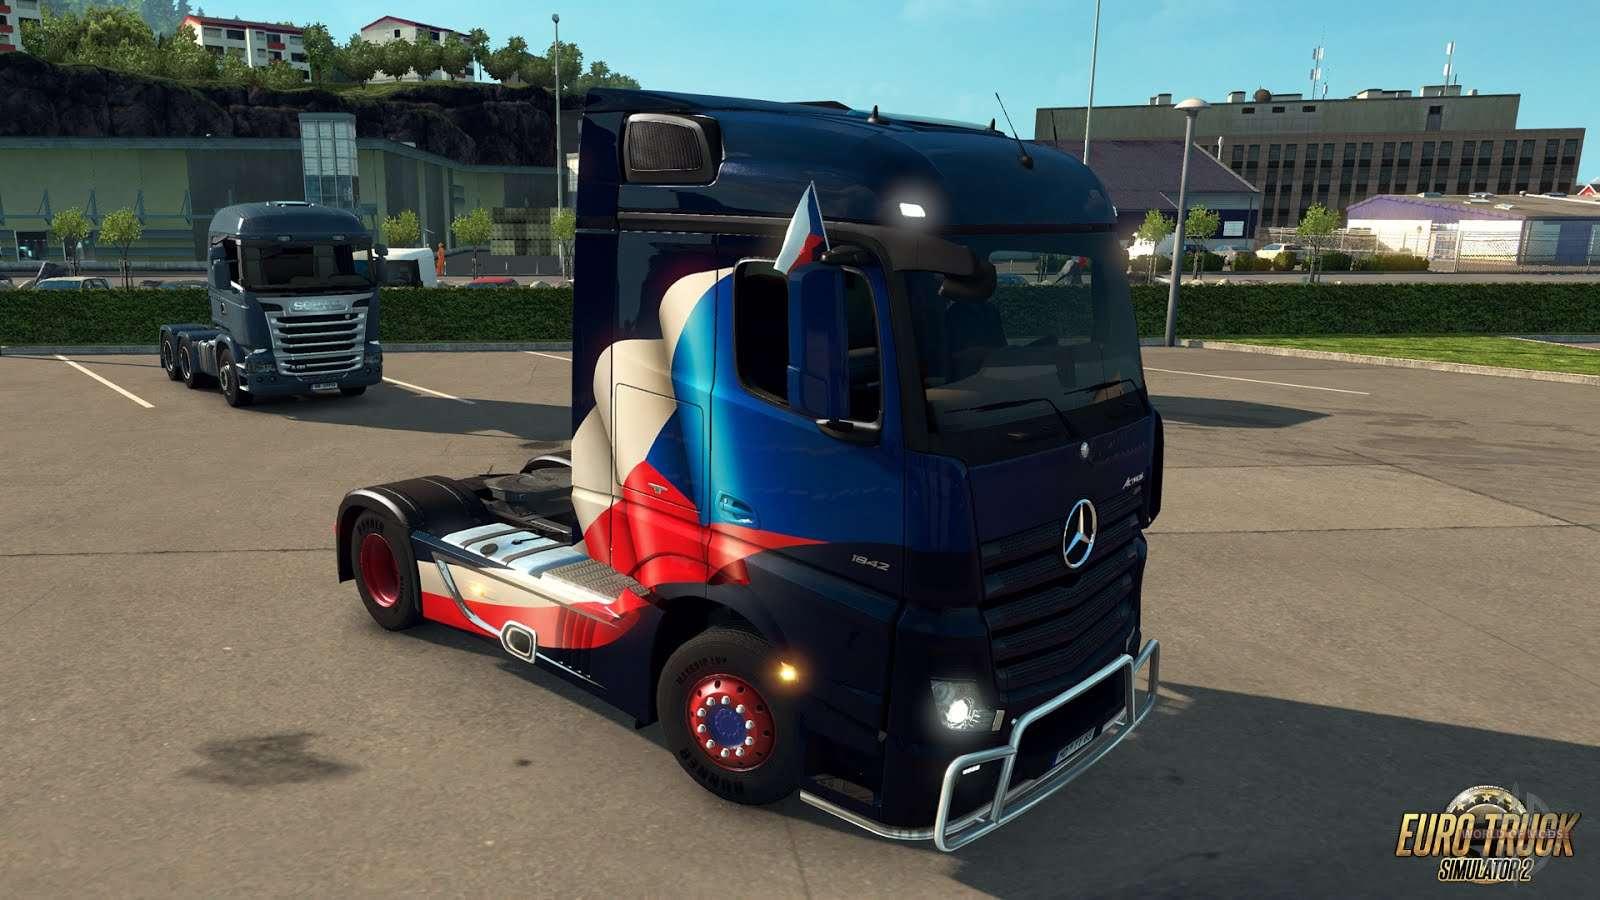 Euro truck simulator download for windows 10